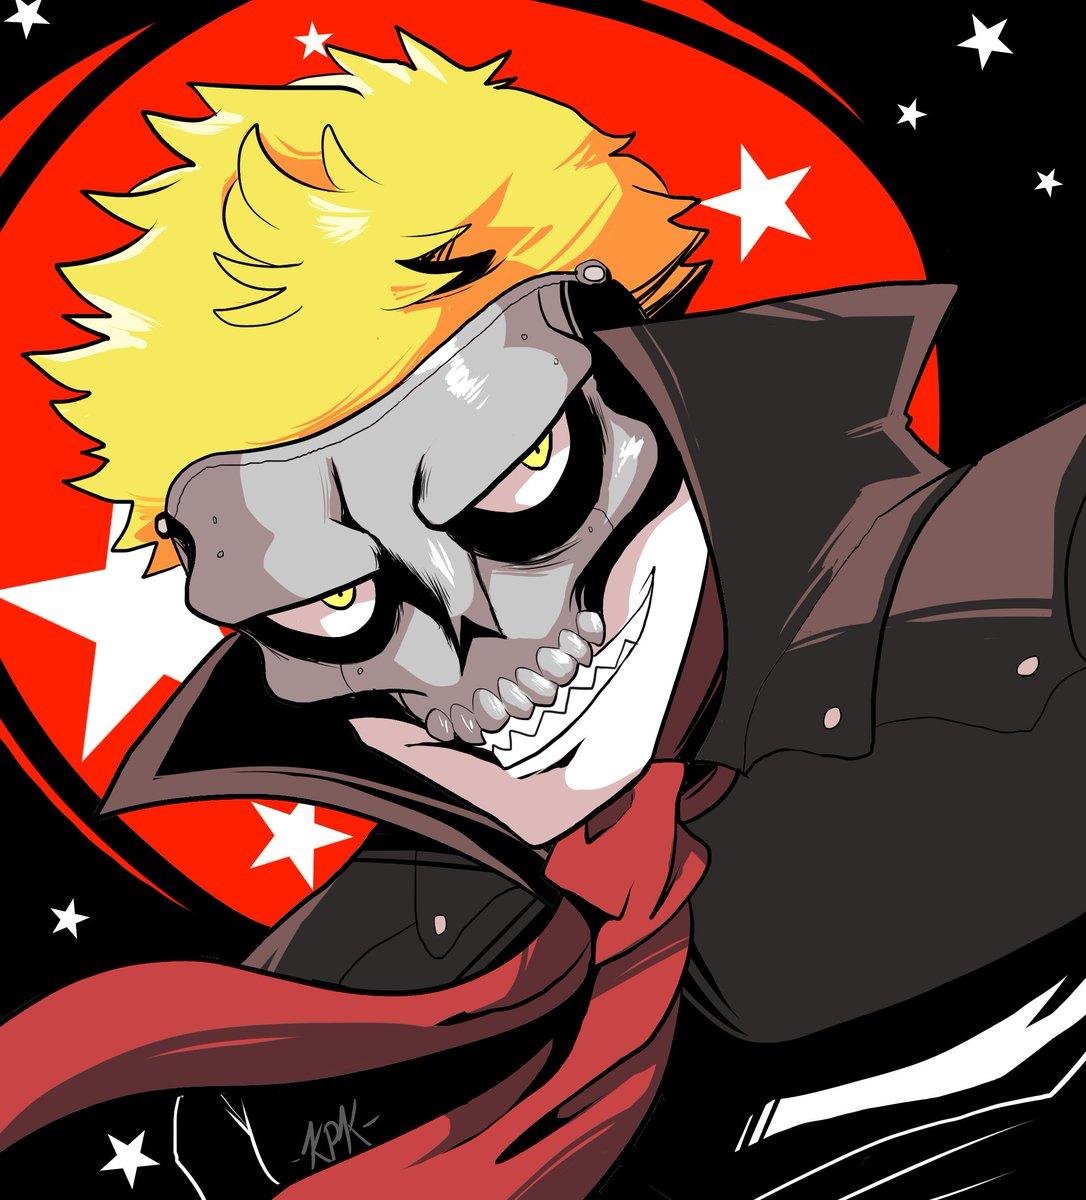 Kapapkip On Twitter Yo Who Here Likes Pirate Naruto From